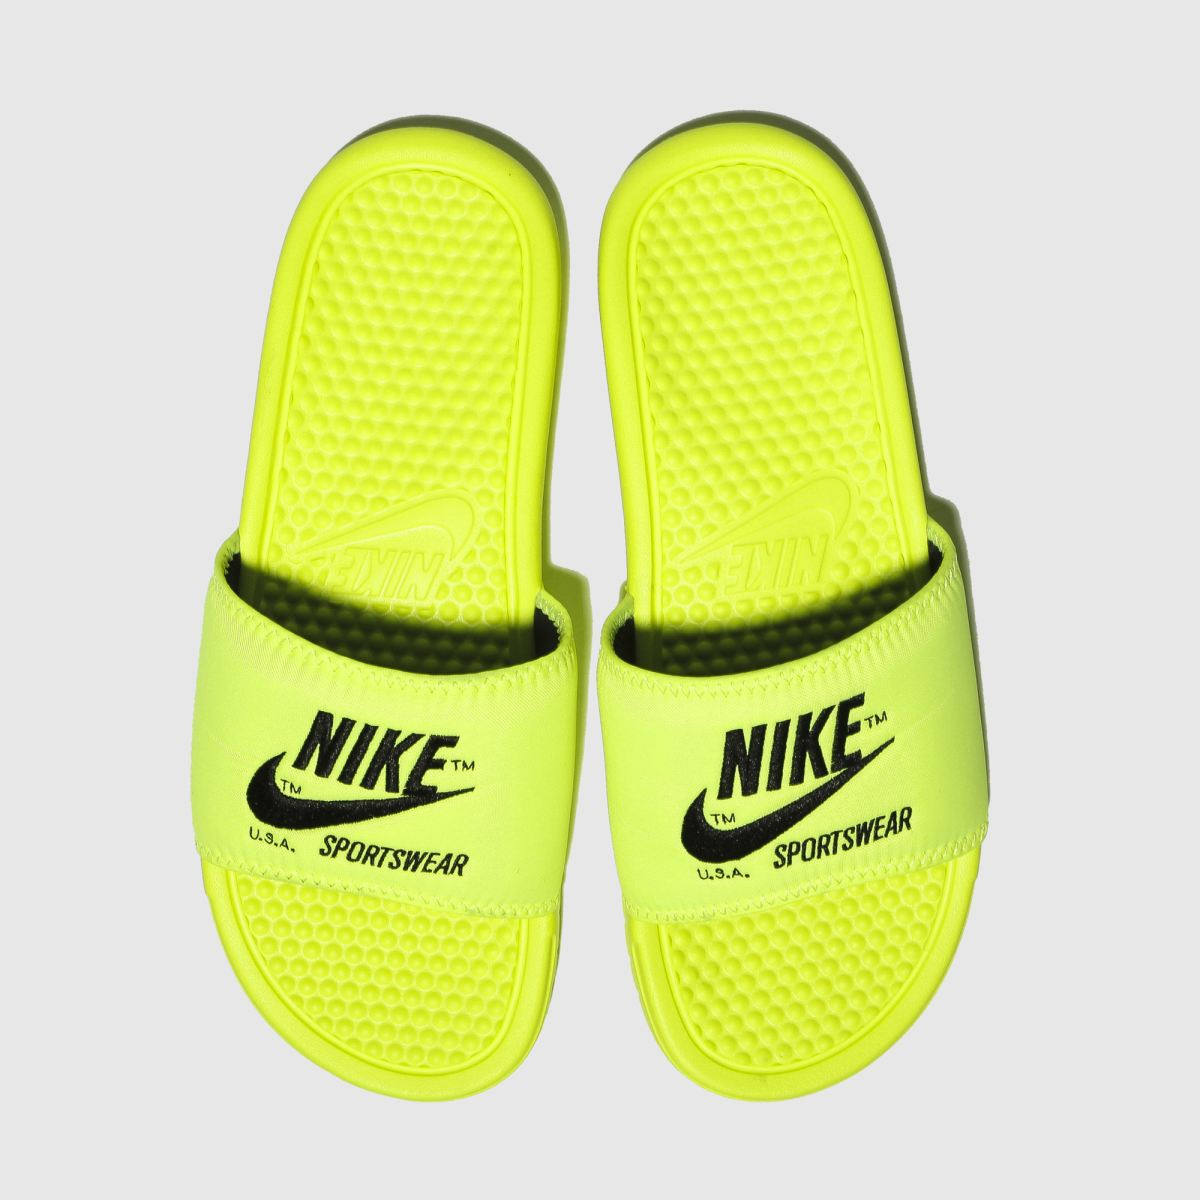 Nike Yellow Benassi Slide Sandals